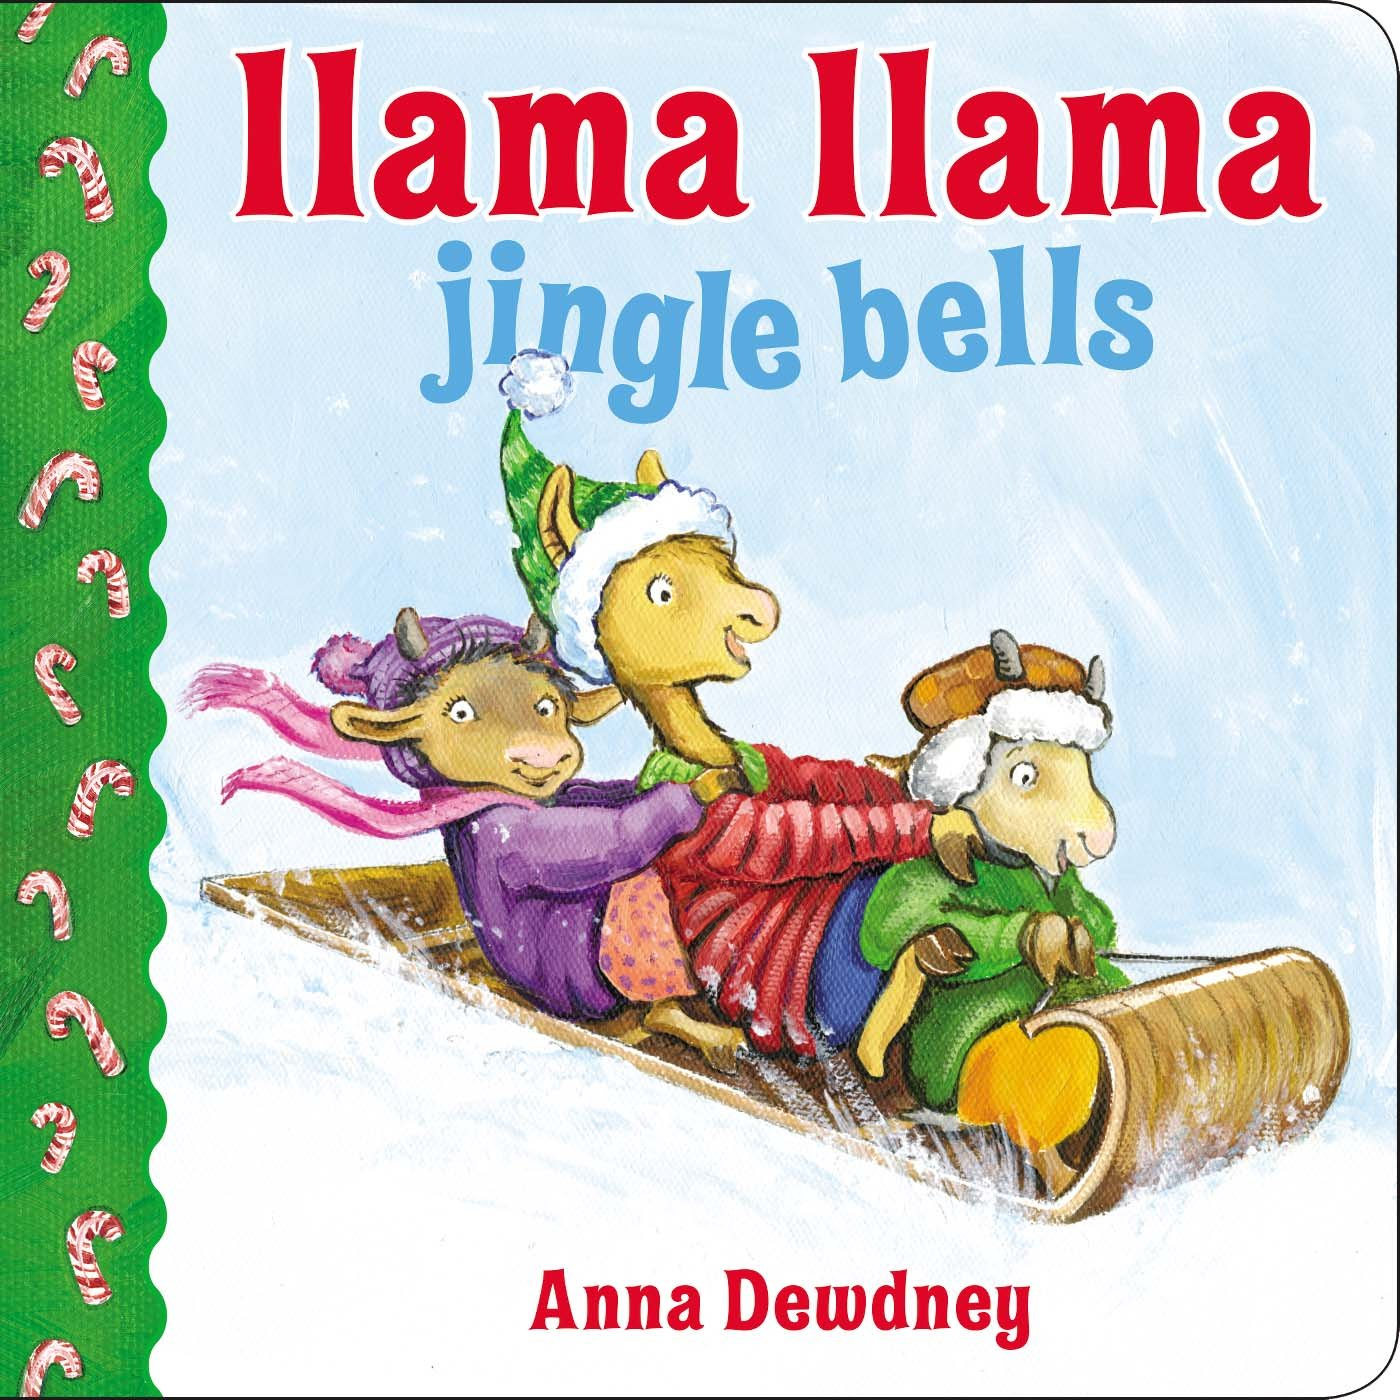 25 Best-Selling Children's Christmas Books - DealTown, US Patch